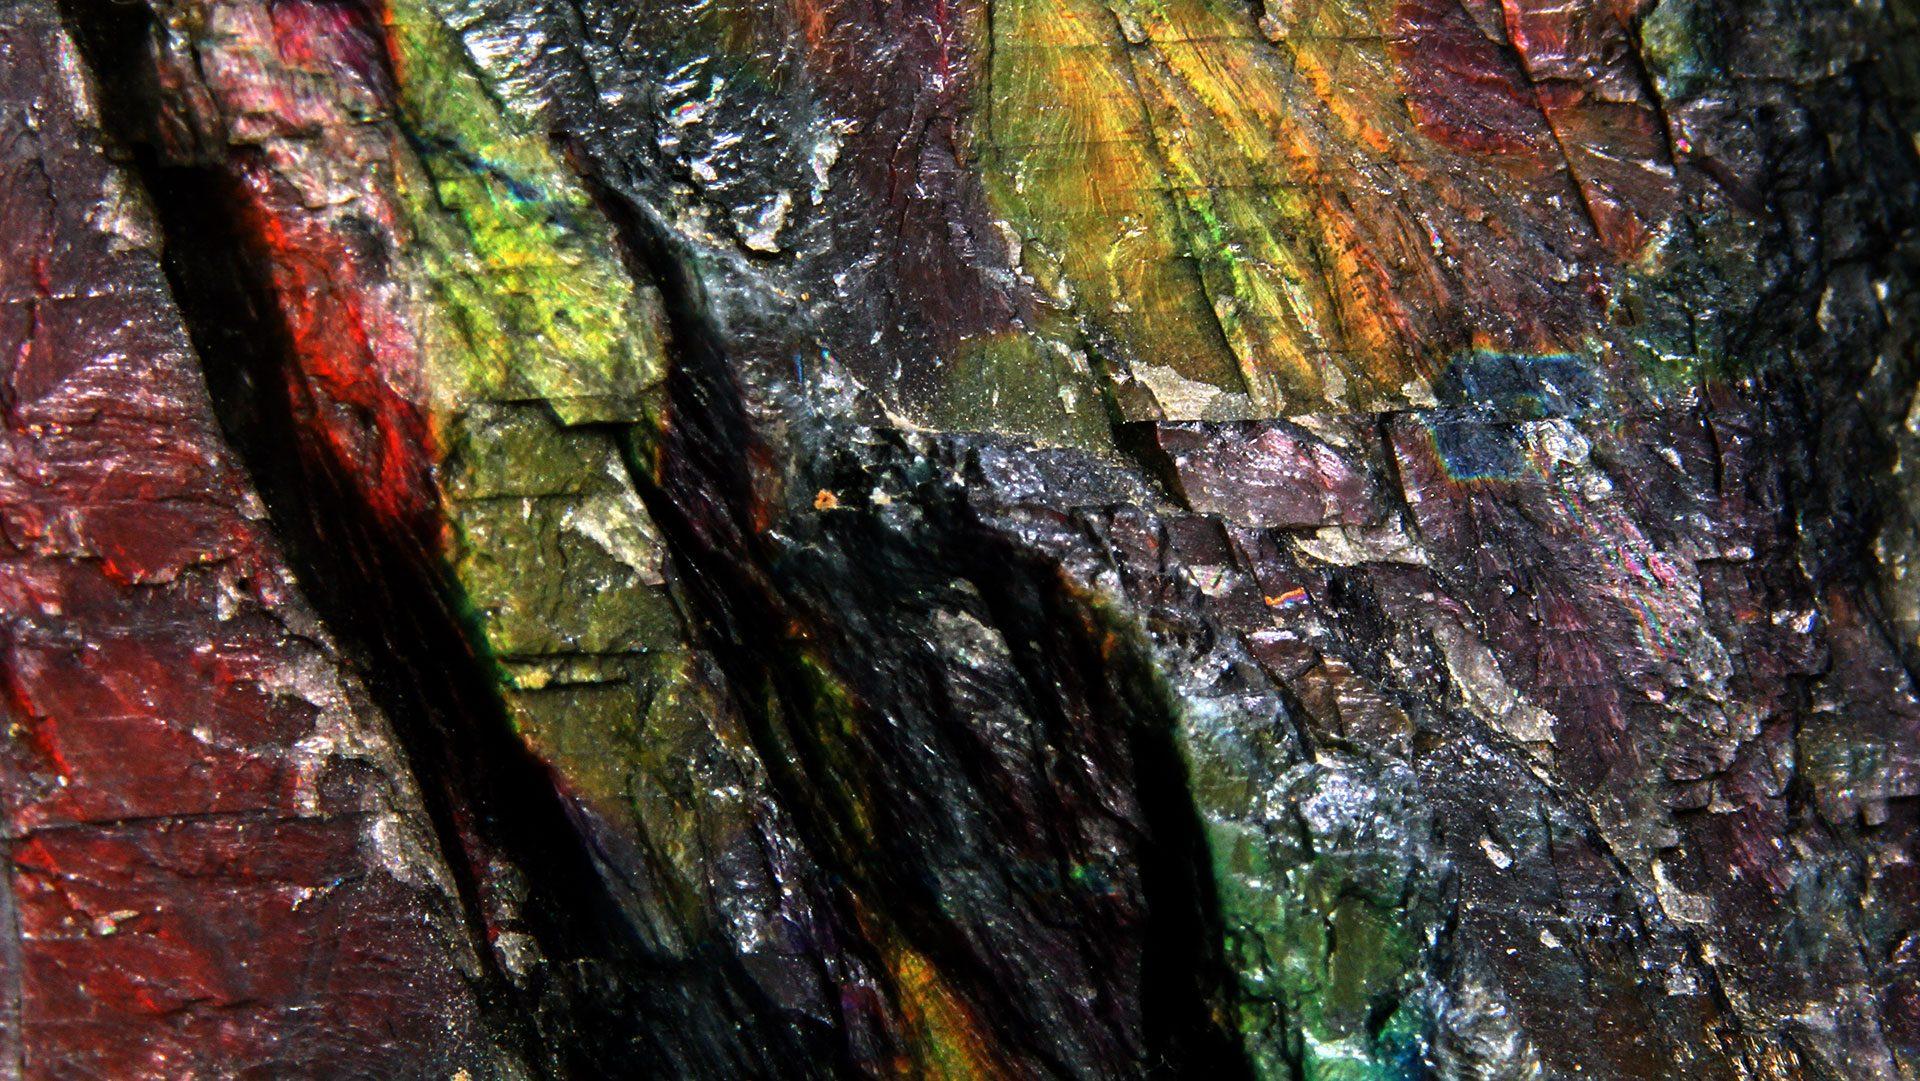 Spectrolite Crystal Specimen - Mineral Specimen - Original Photo by Lech Darski